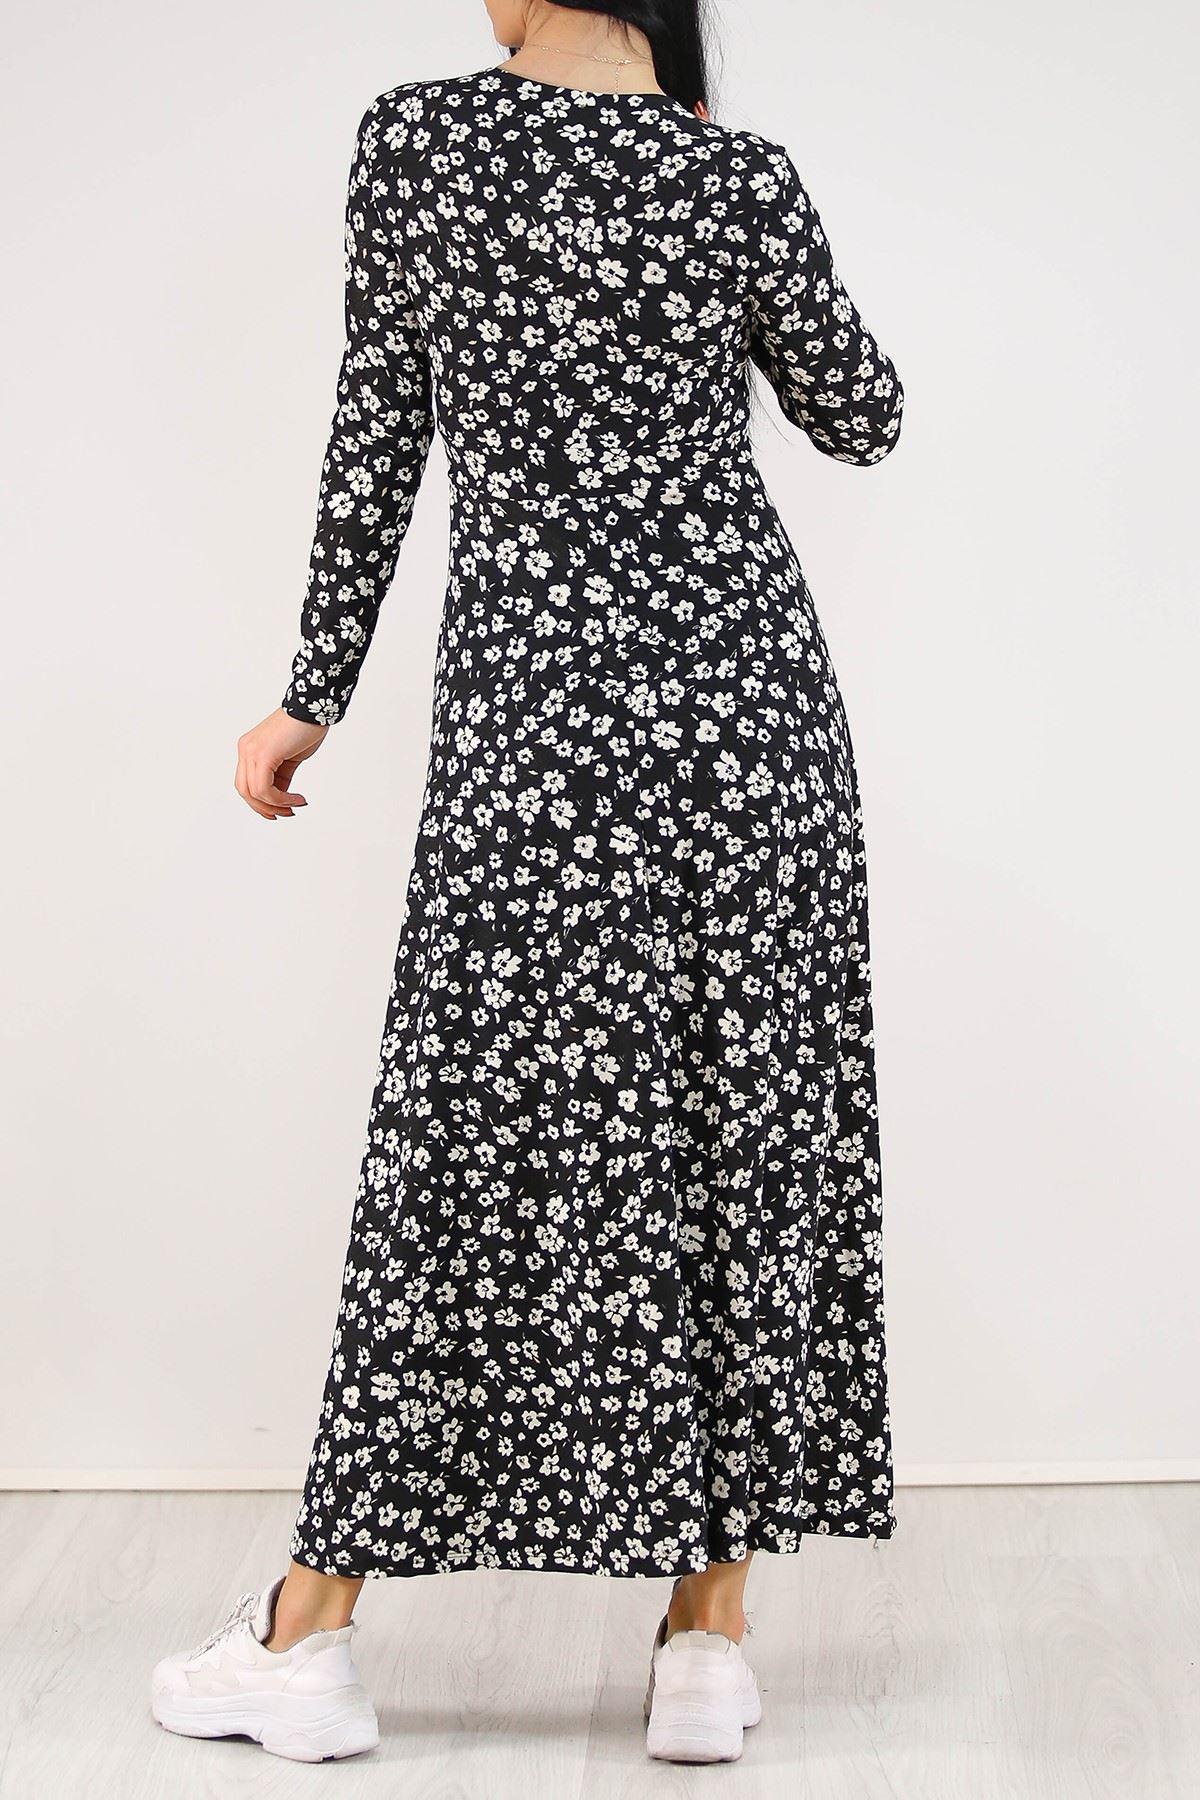 Çiçekli Elbise Siyah - 4987.716.